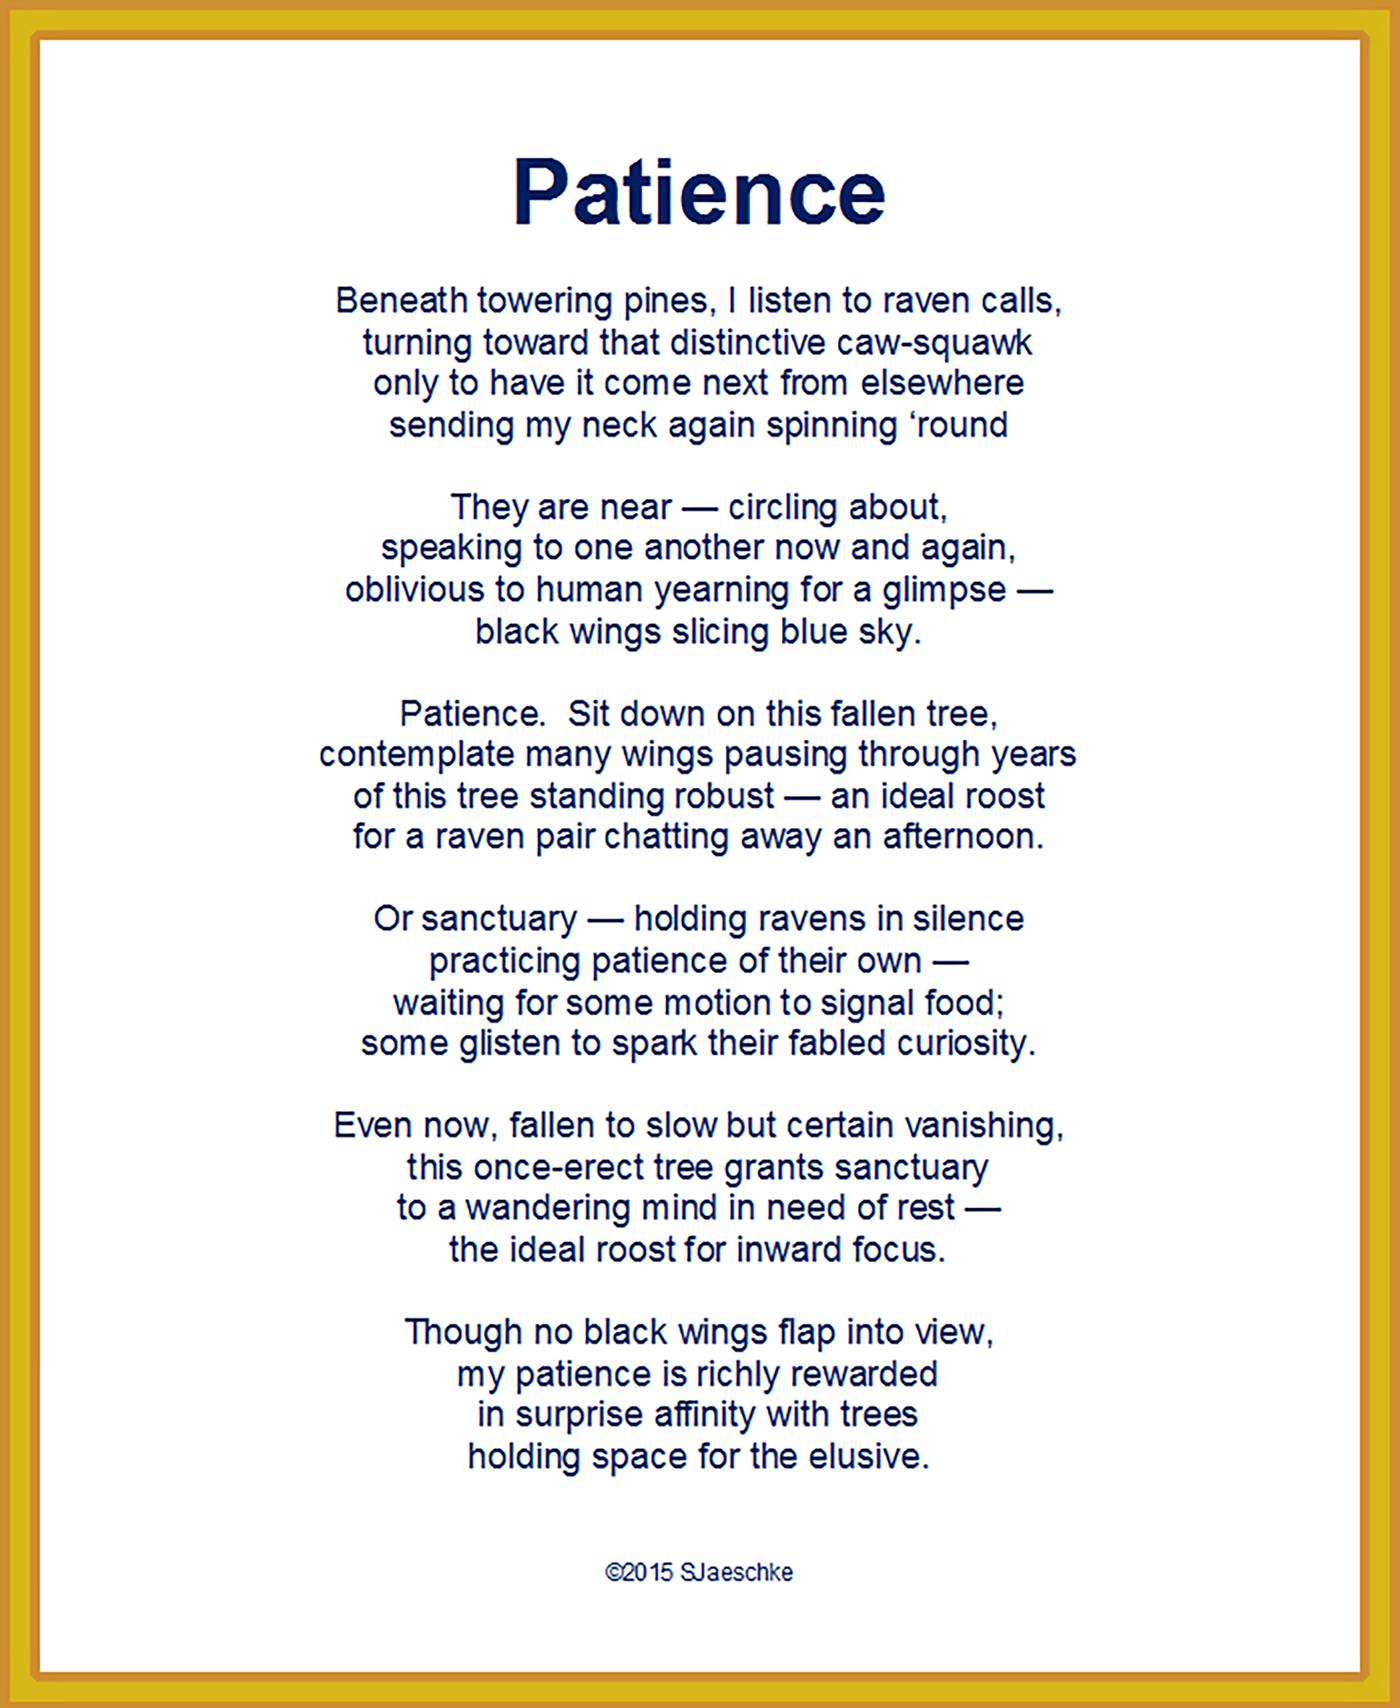 Post_2015-08-17_Poem_Patience